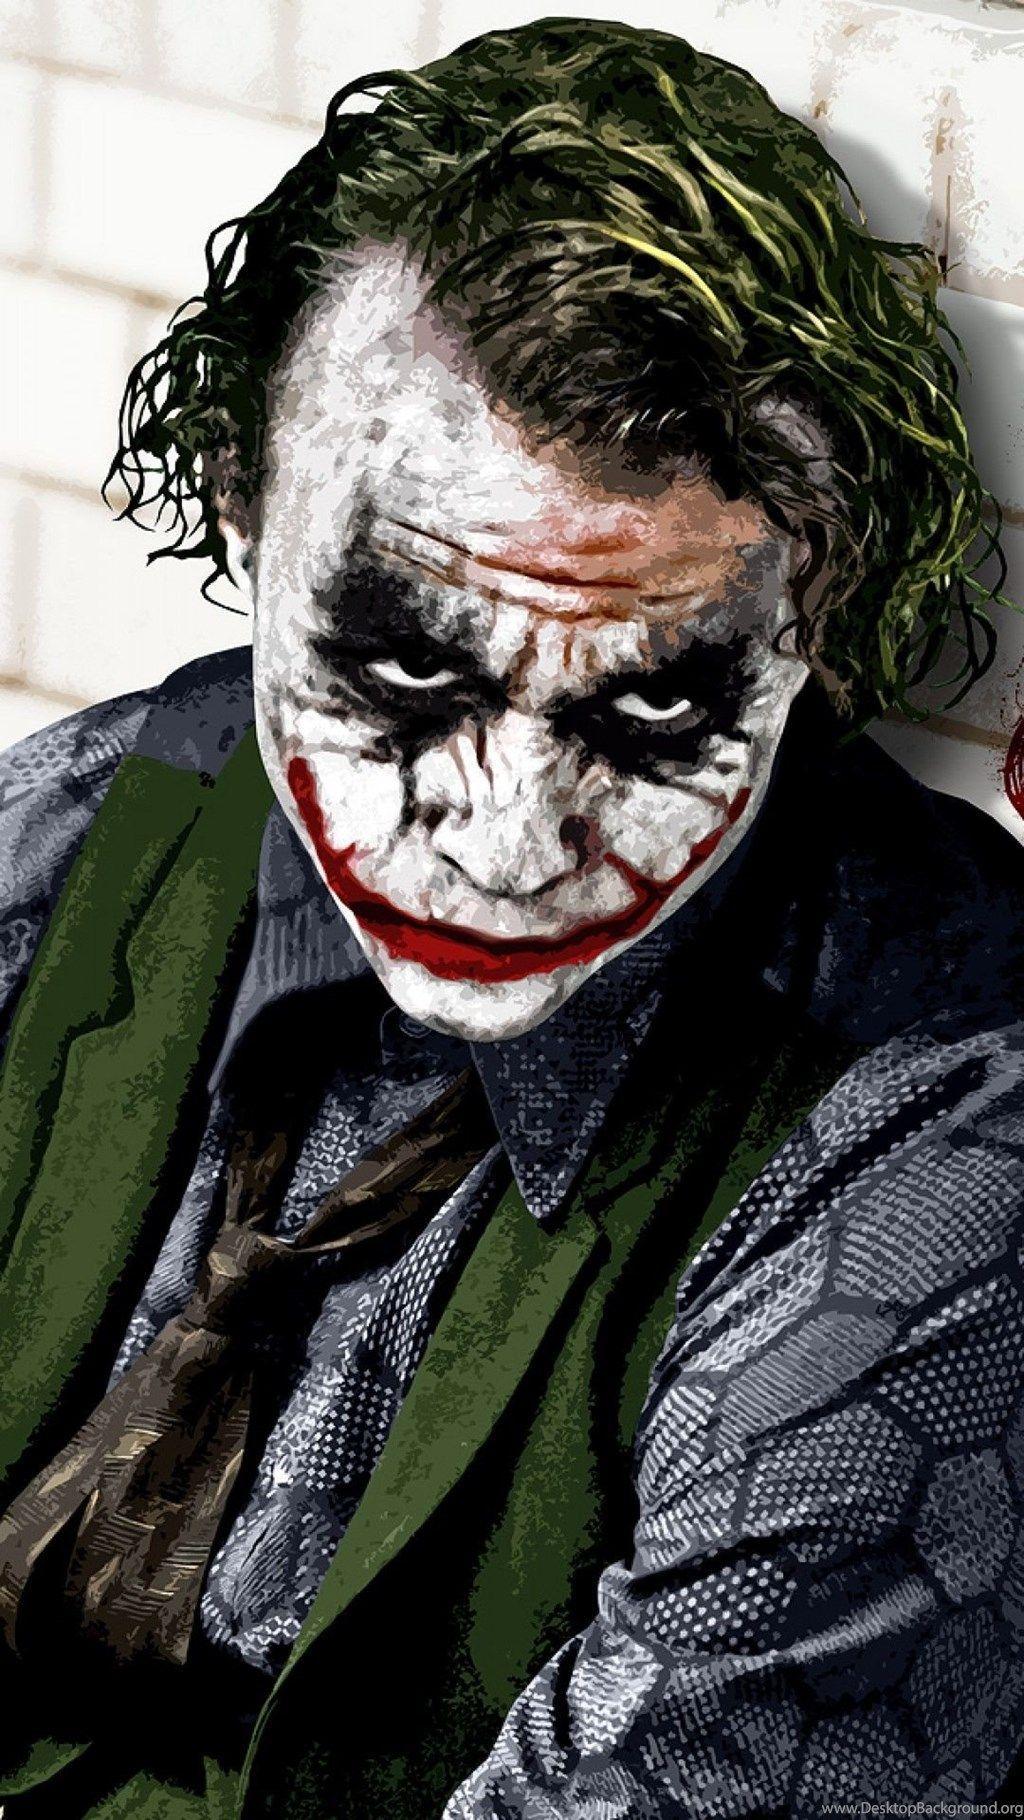 Joker For Iphone Wallpapers Top Free Joker For Iphone Backgrounds Wallpaperaccess